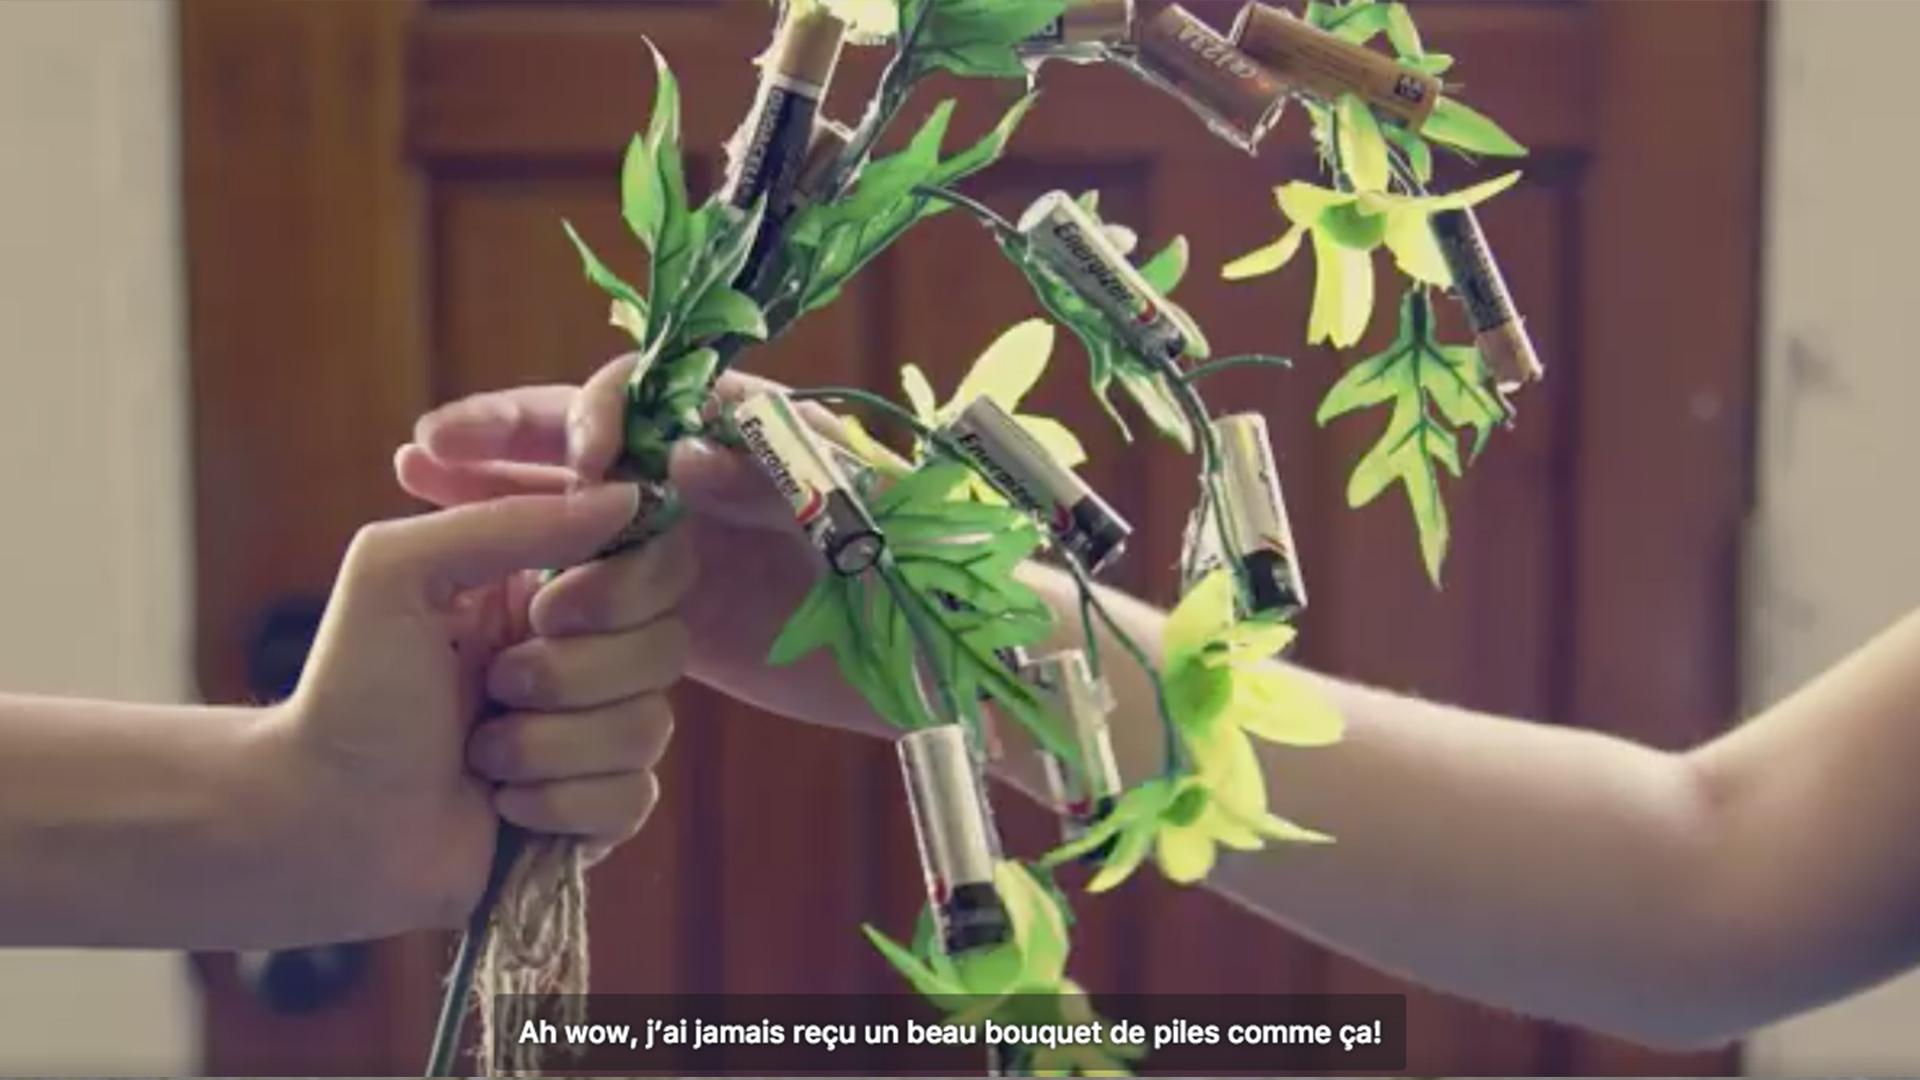 jour_de_la_terre_quebec_qc_blogue_article_trucs_astuces_ariane_arbour_green_tes_piles_appel_a_recycler_3